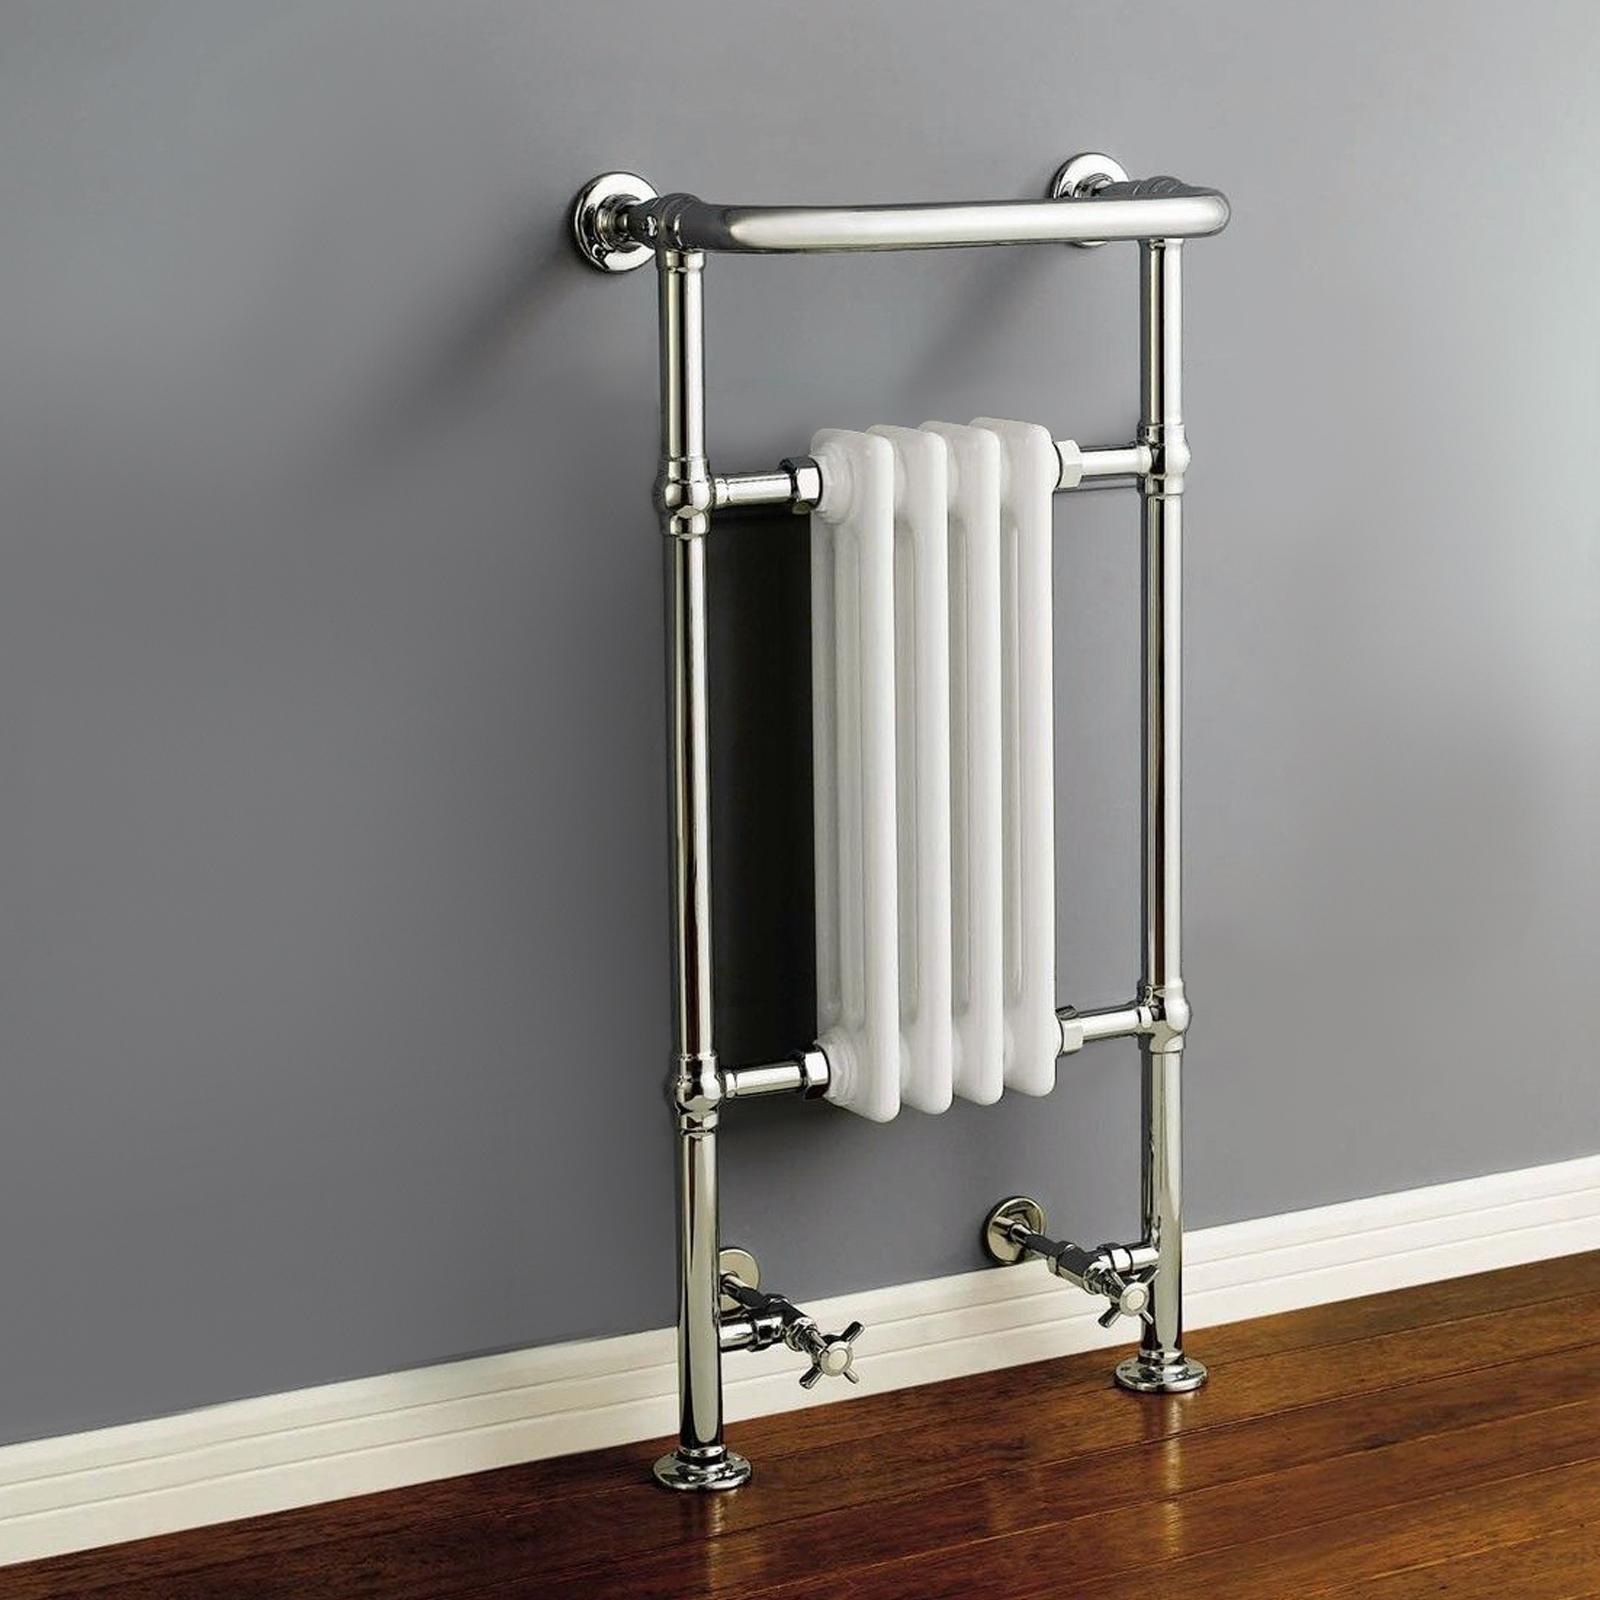 Traditional Victorian Chrome Bathroom Heated Towel Rail